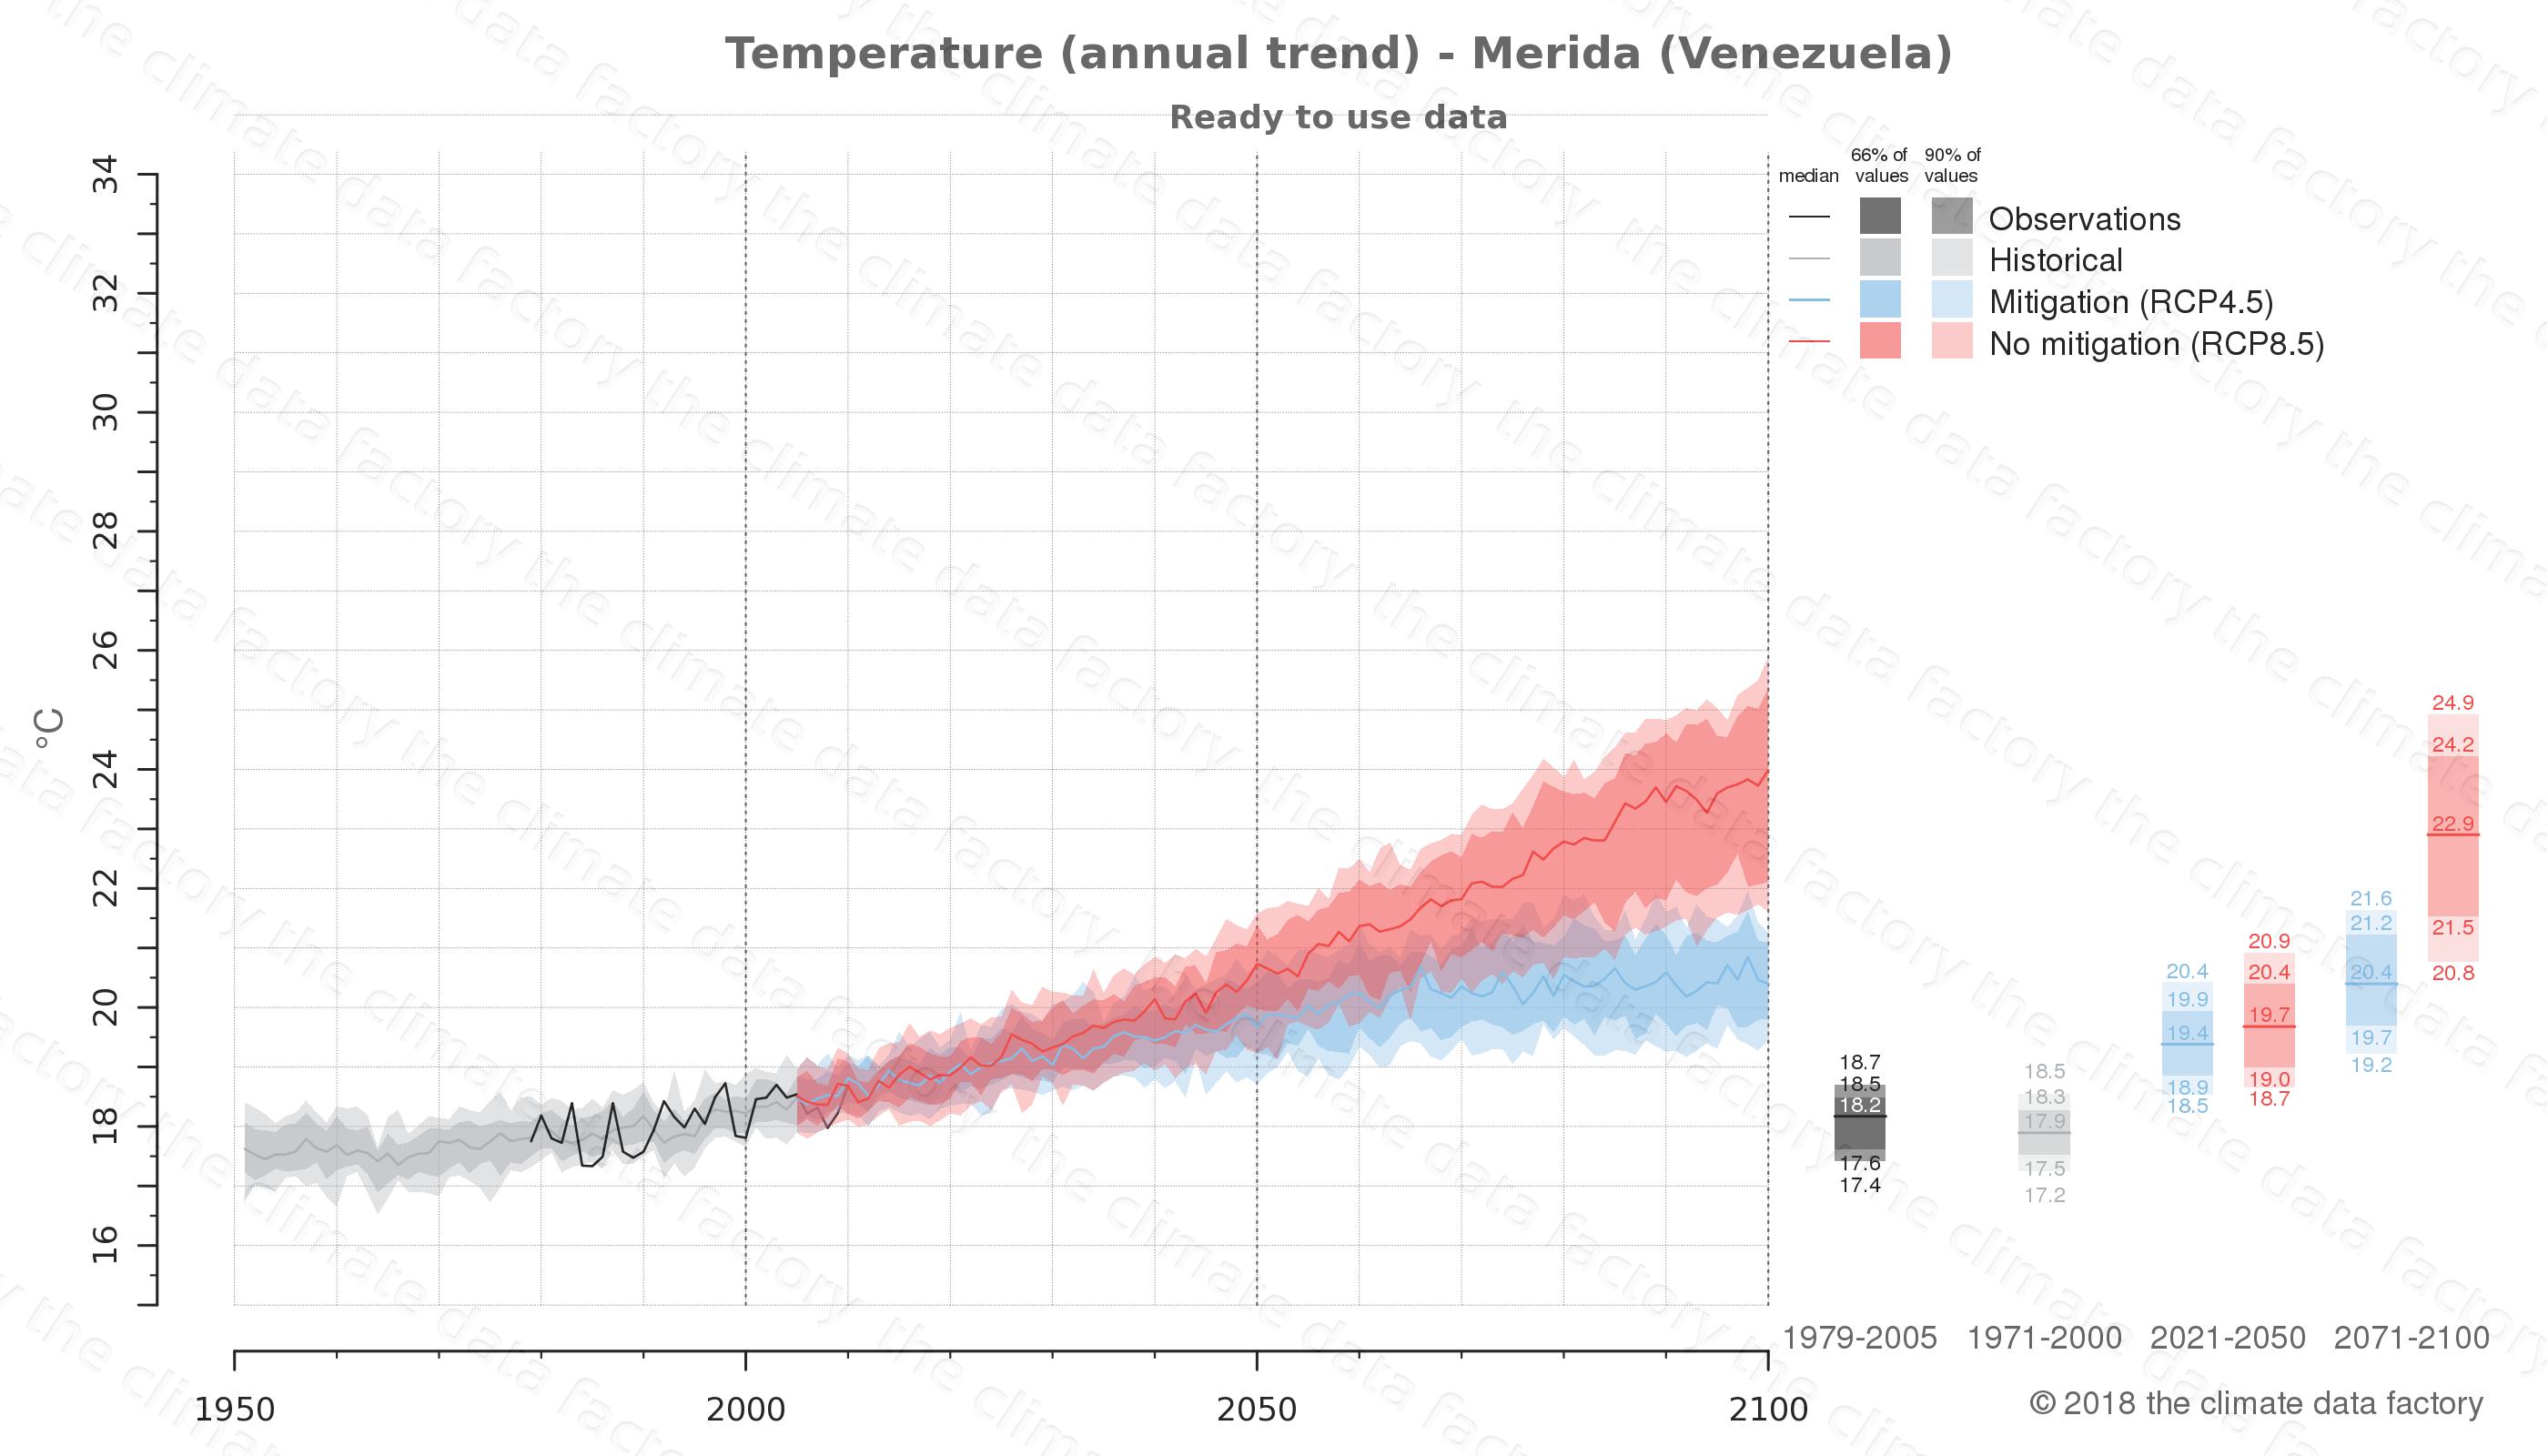 climate change data policy adaptation climate graph city data temperature merida venezuela